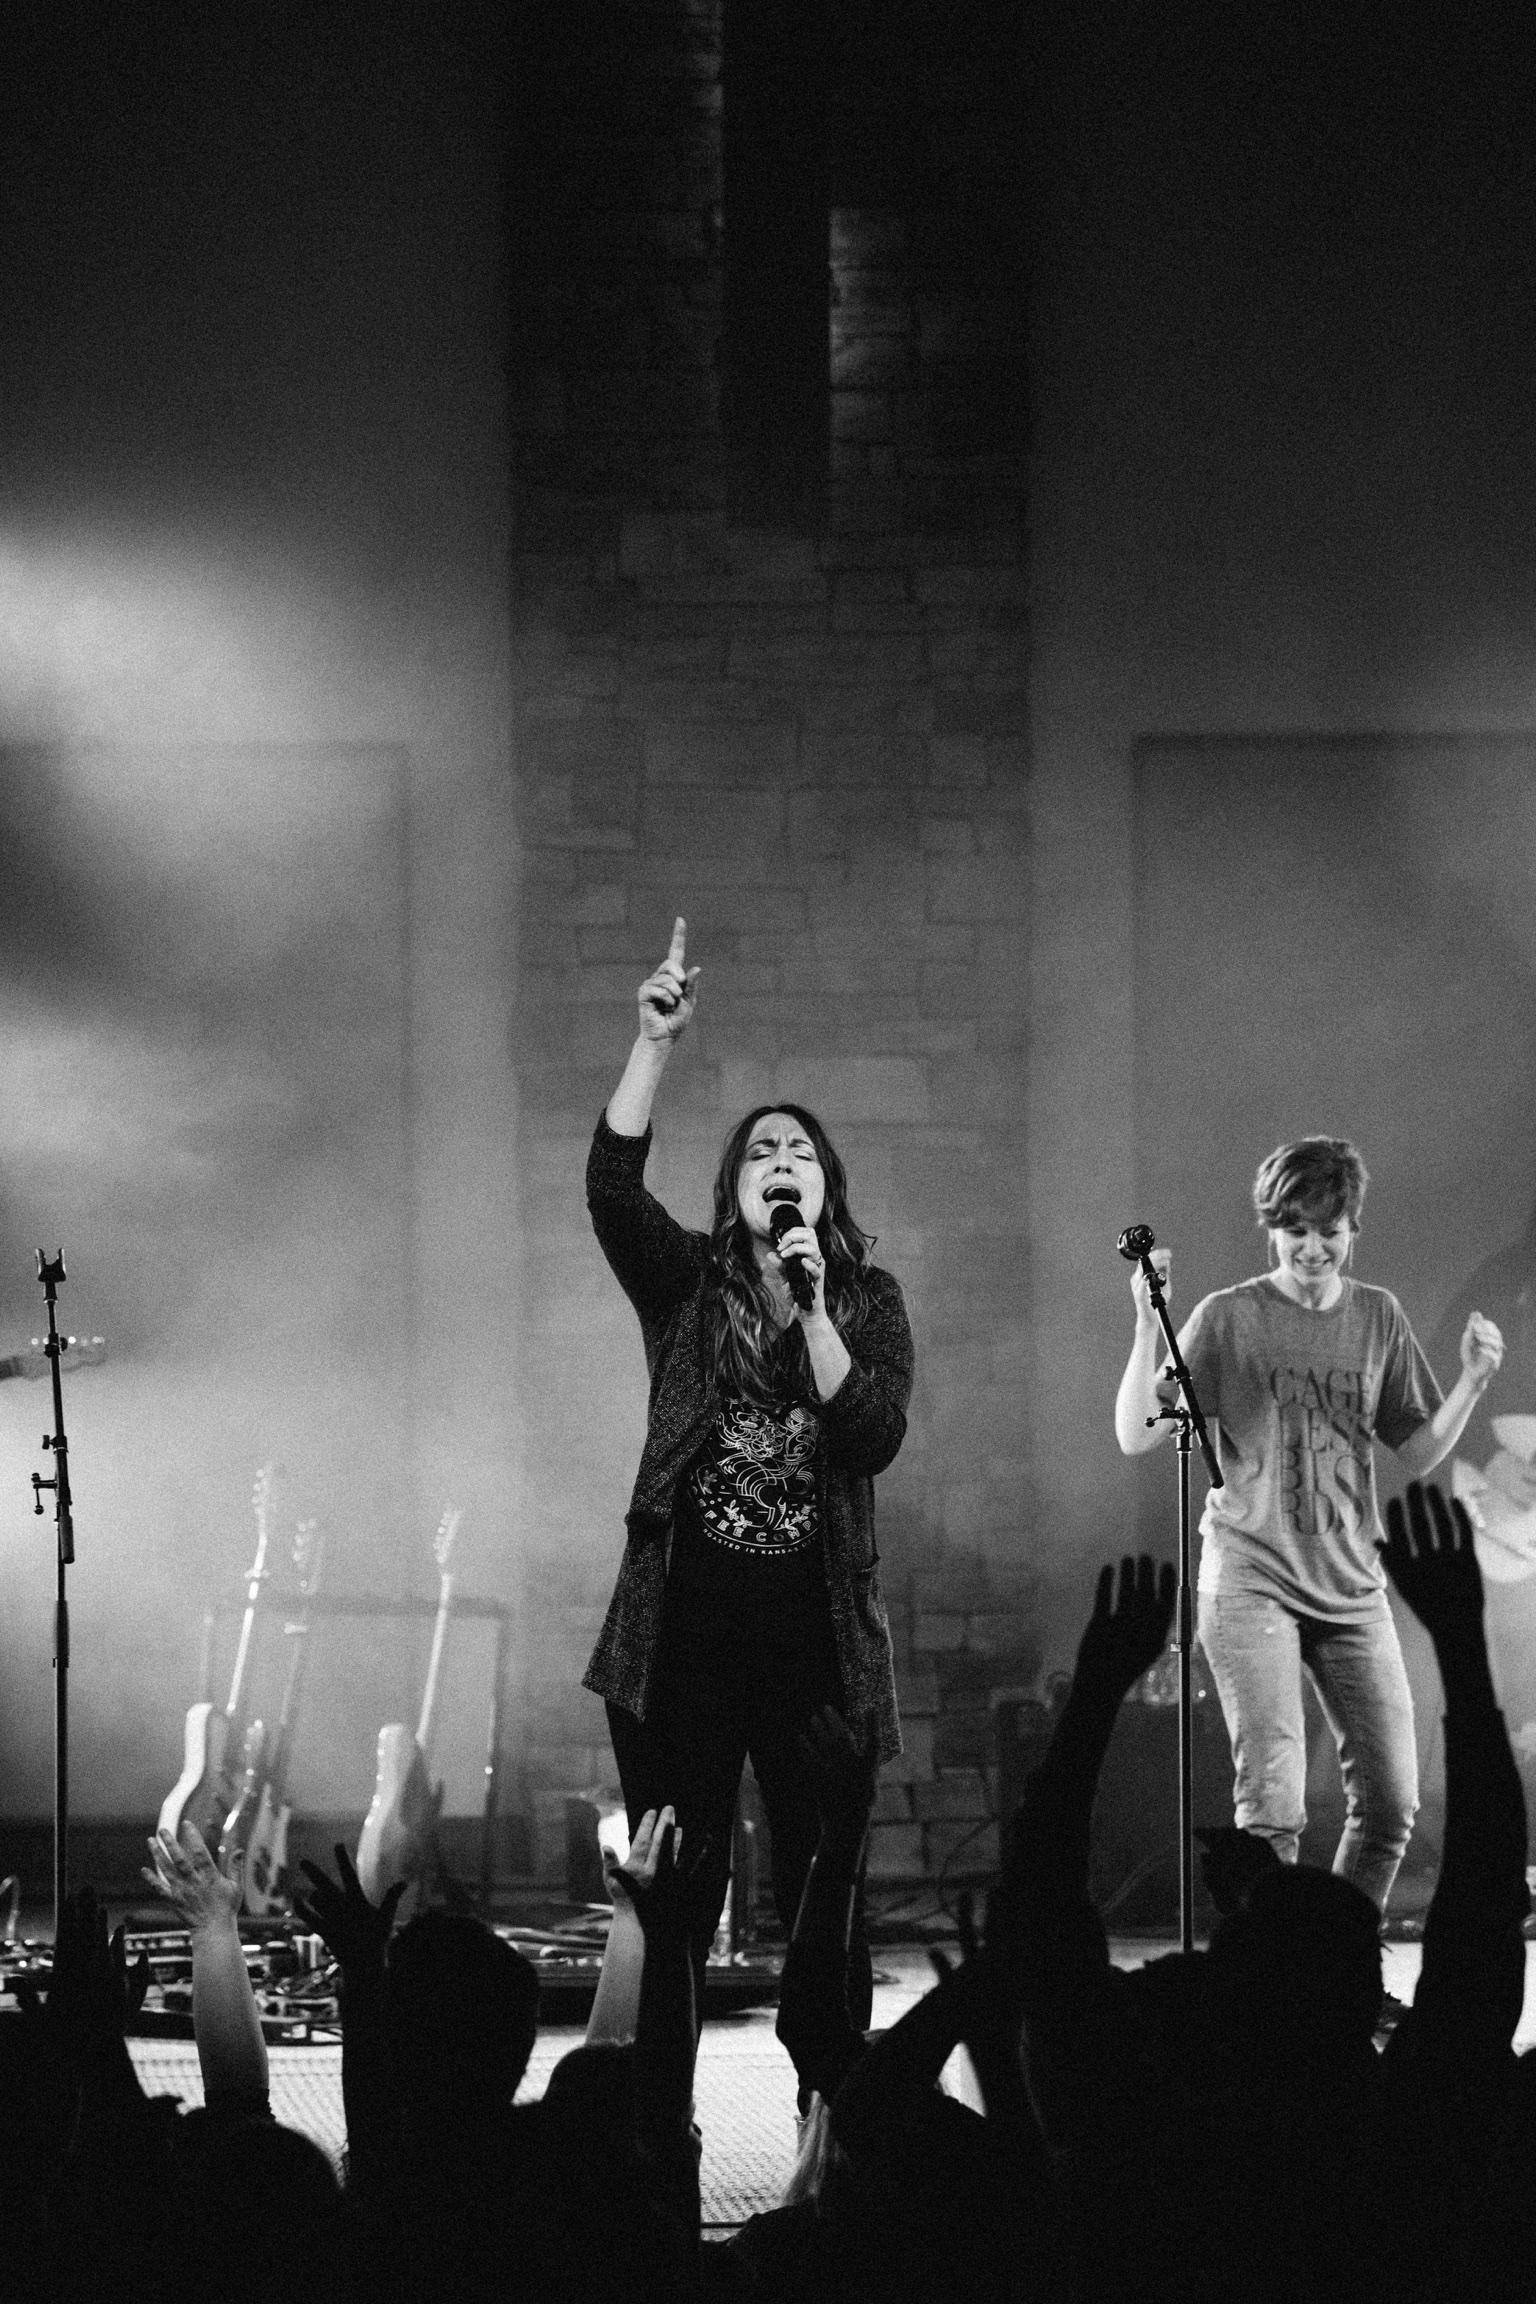 20190316_lambs_hill_worship_night-59.jpg